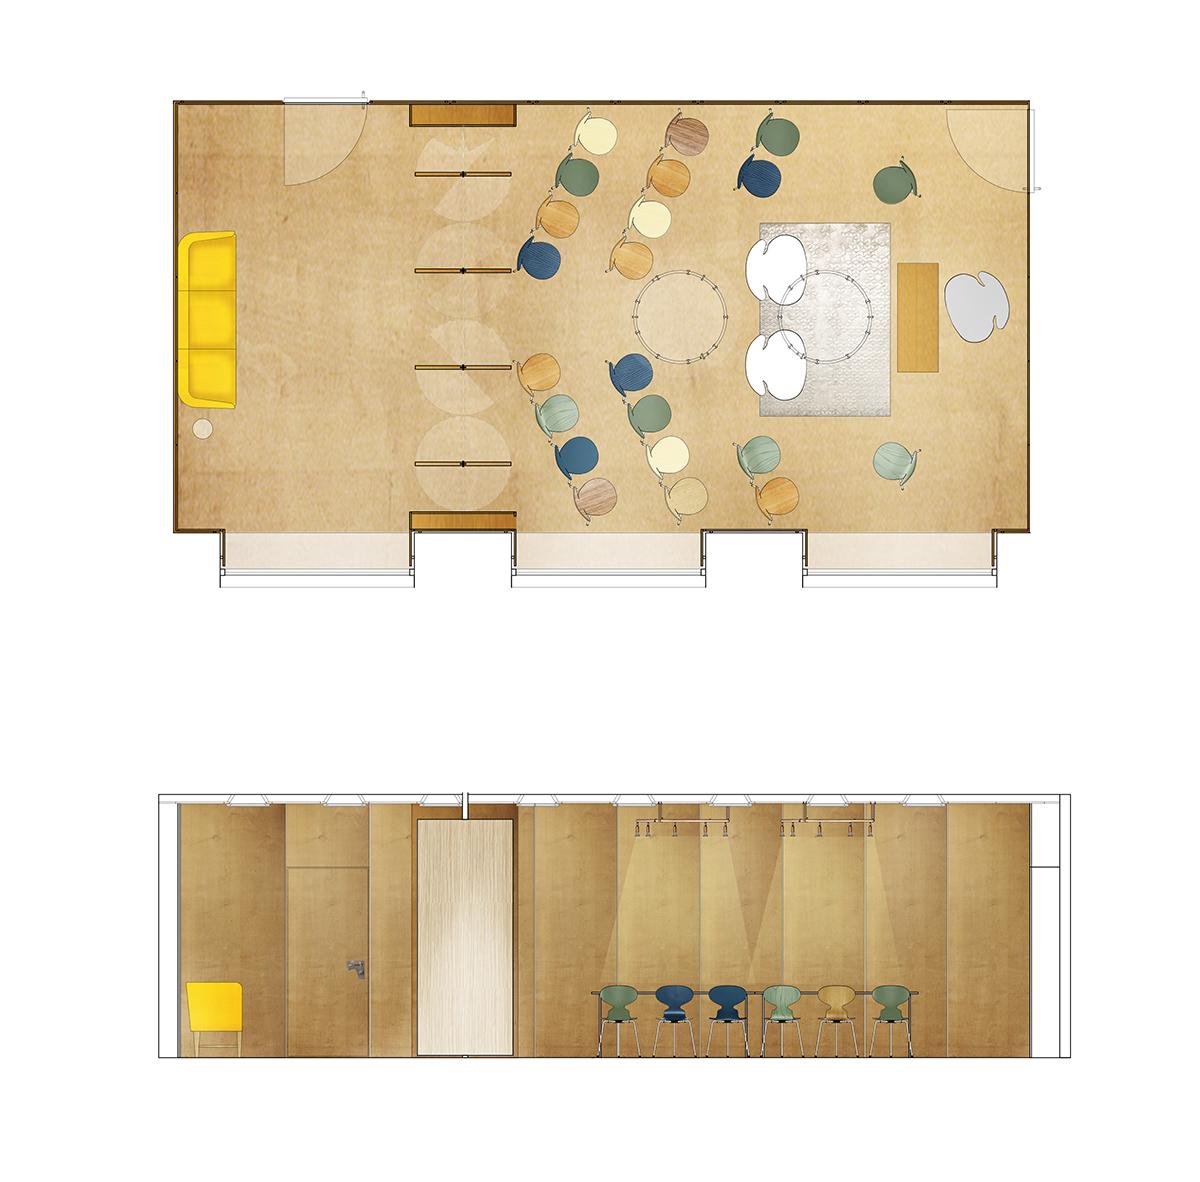 (U:\1139 Glostrup R345dhus- rum 200\07 Tegninger\07-03 Arkit